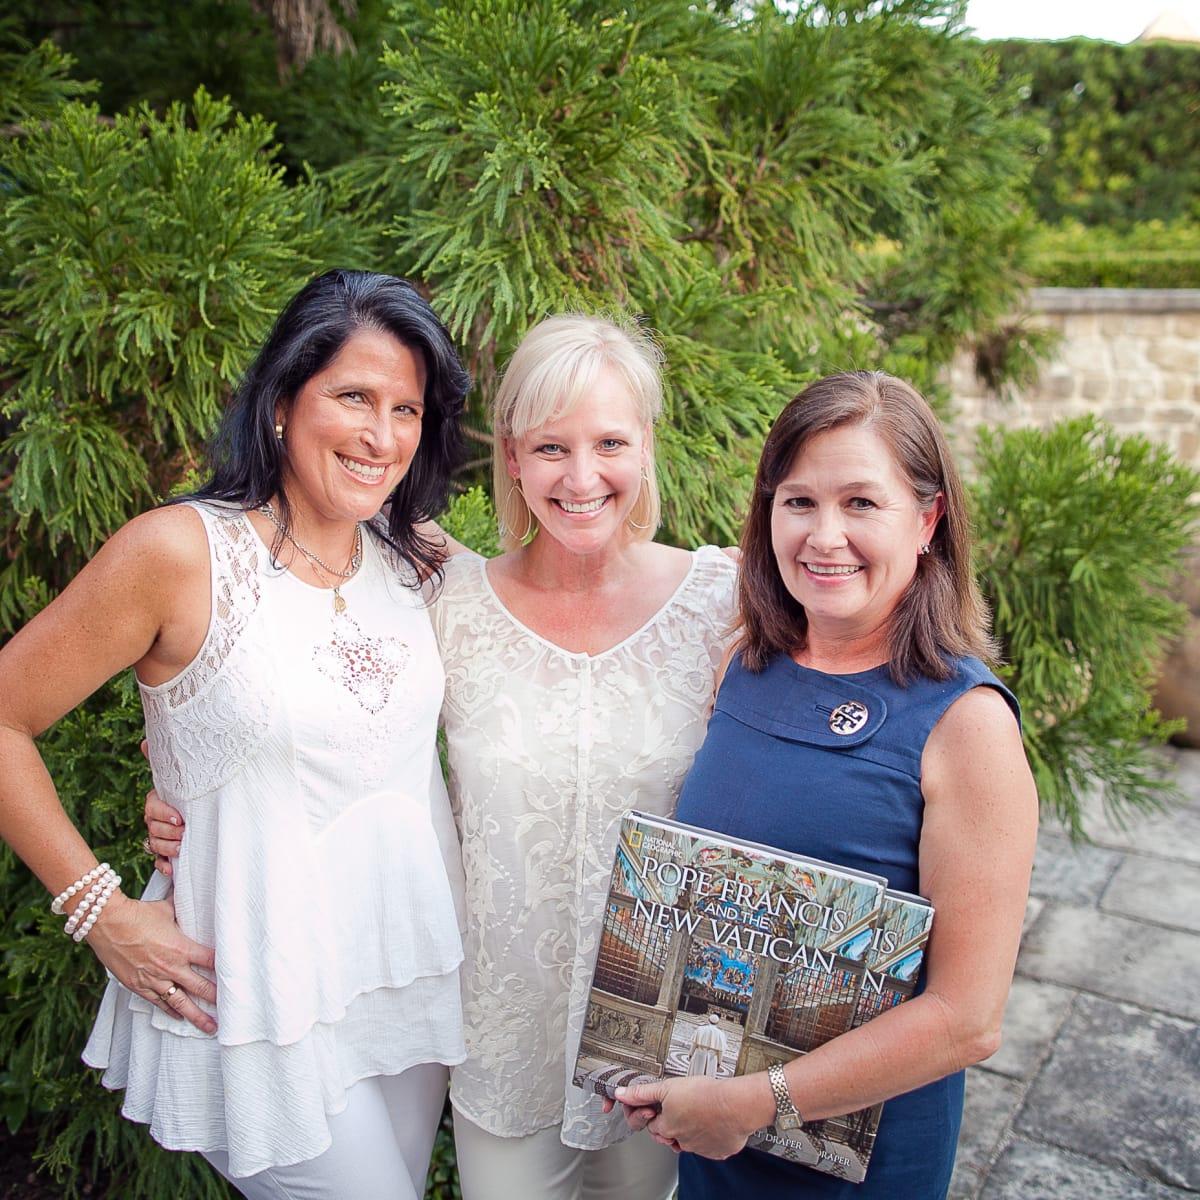 Houston, Robert Draper book signing, September 2015, Chrissy Demeris, Lizzie Sullivan and Mundi Elam